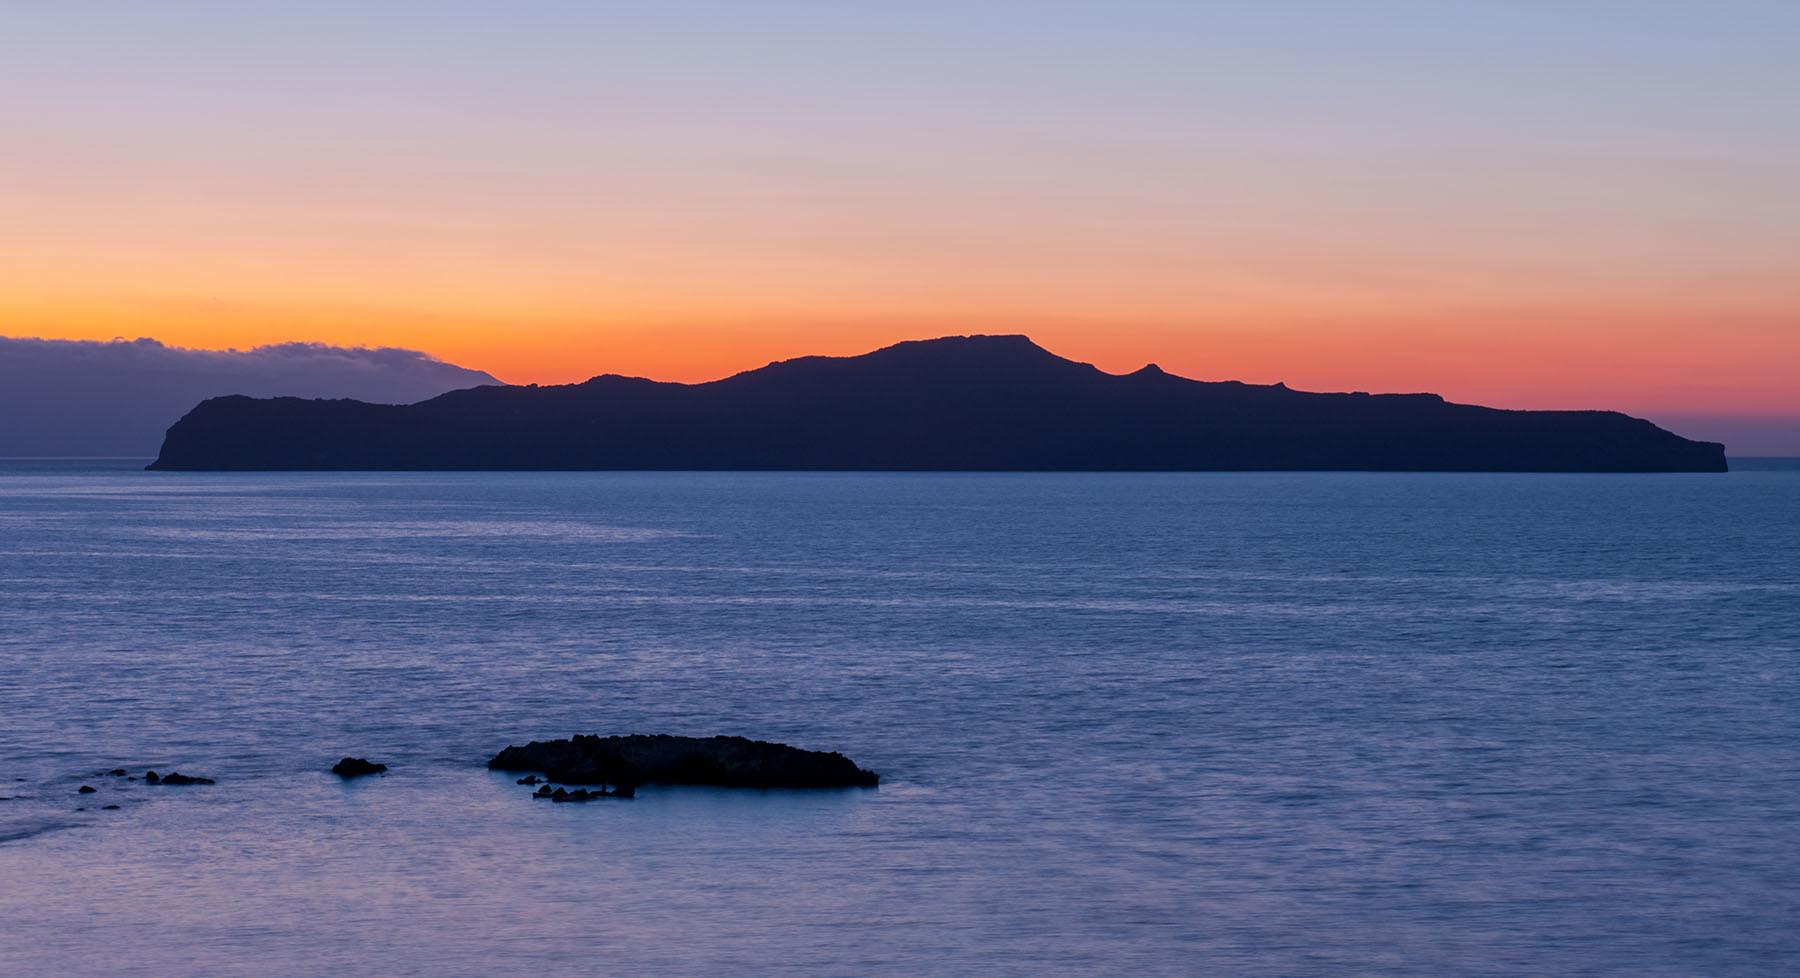 Zachód słońca na Krecie w oklicach Chani